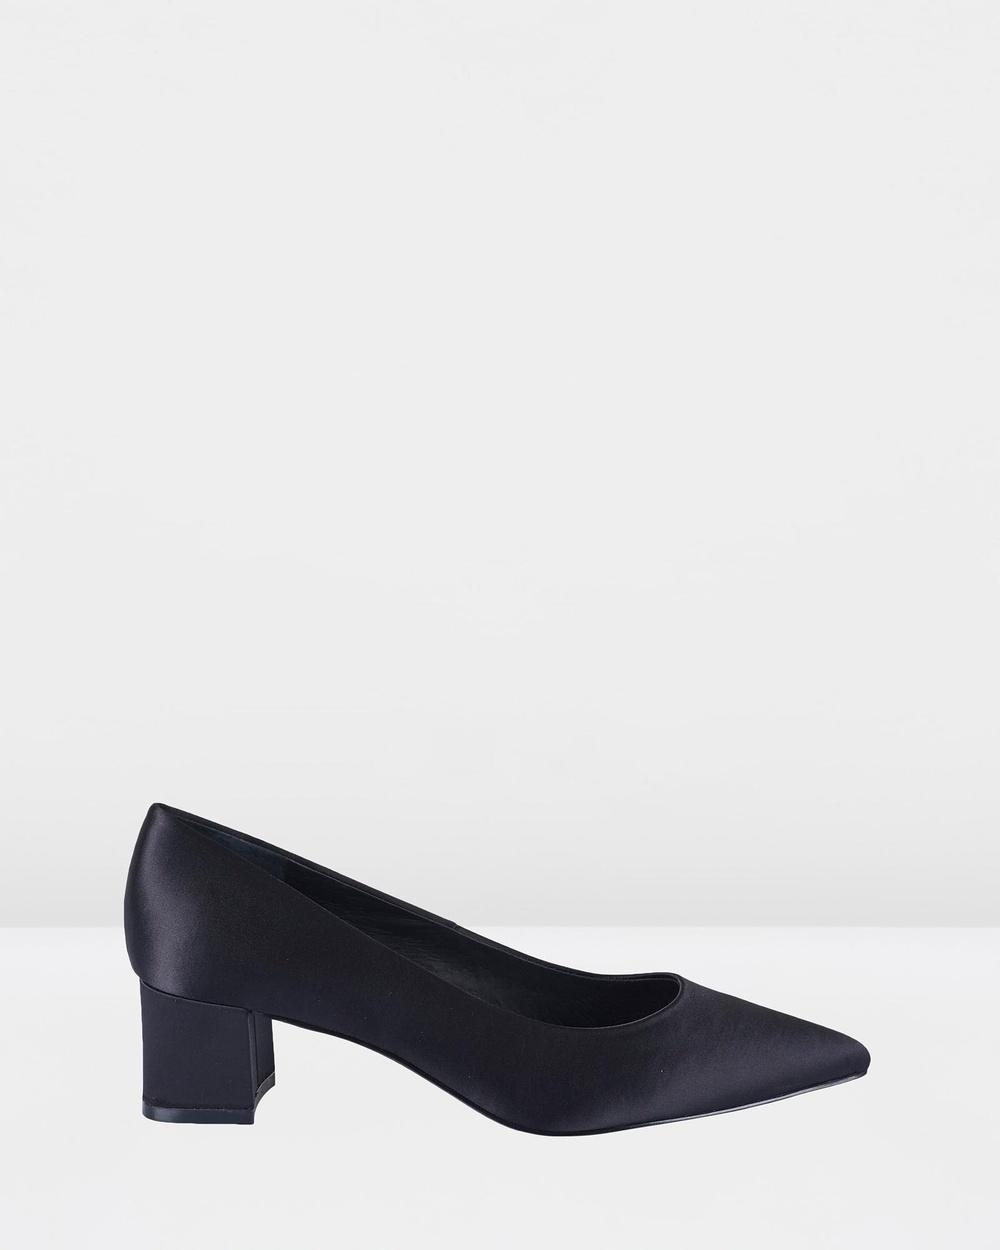 Sol Sana Jade Heels All Pumps Black Satin Jade Heels